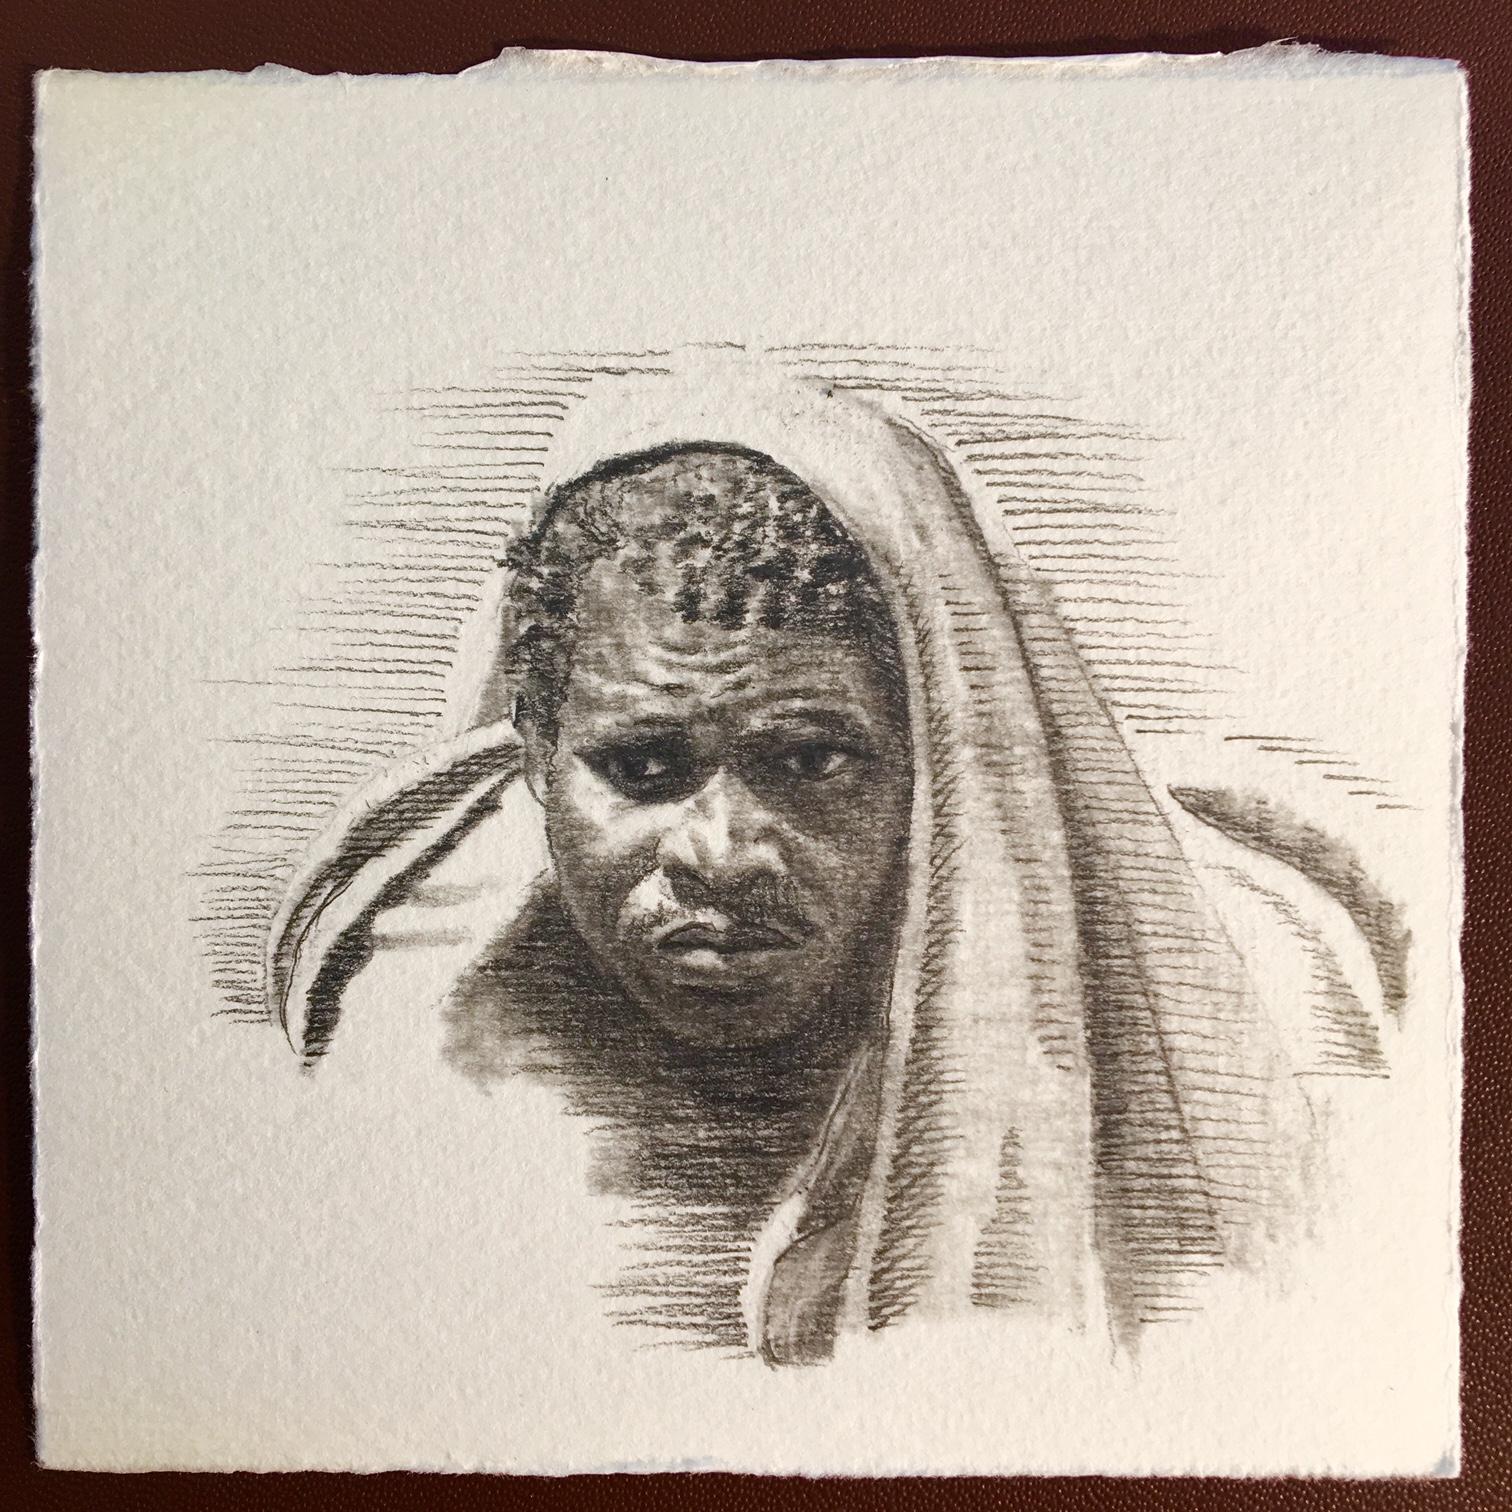 Migrant Drawings IV